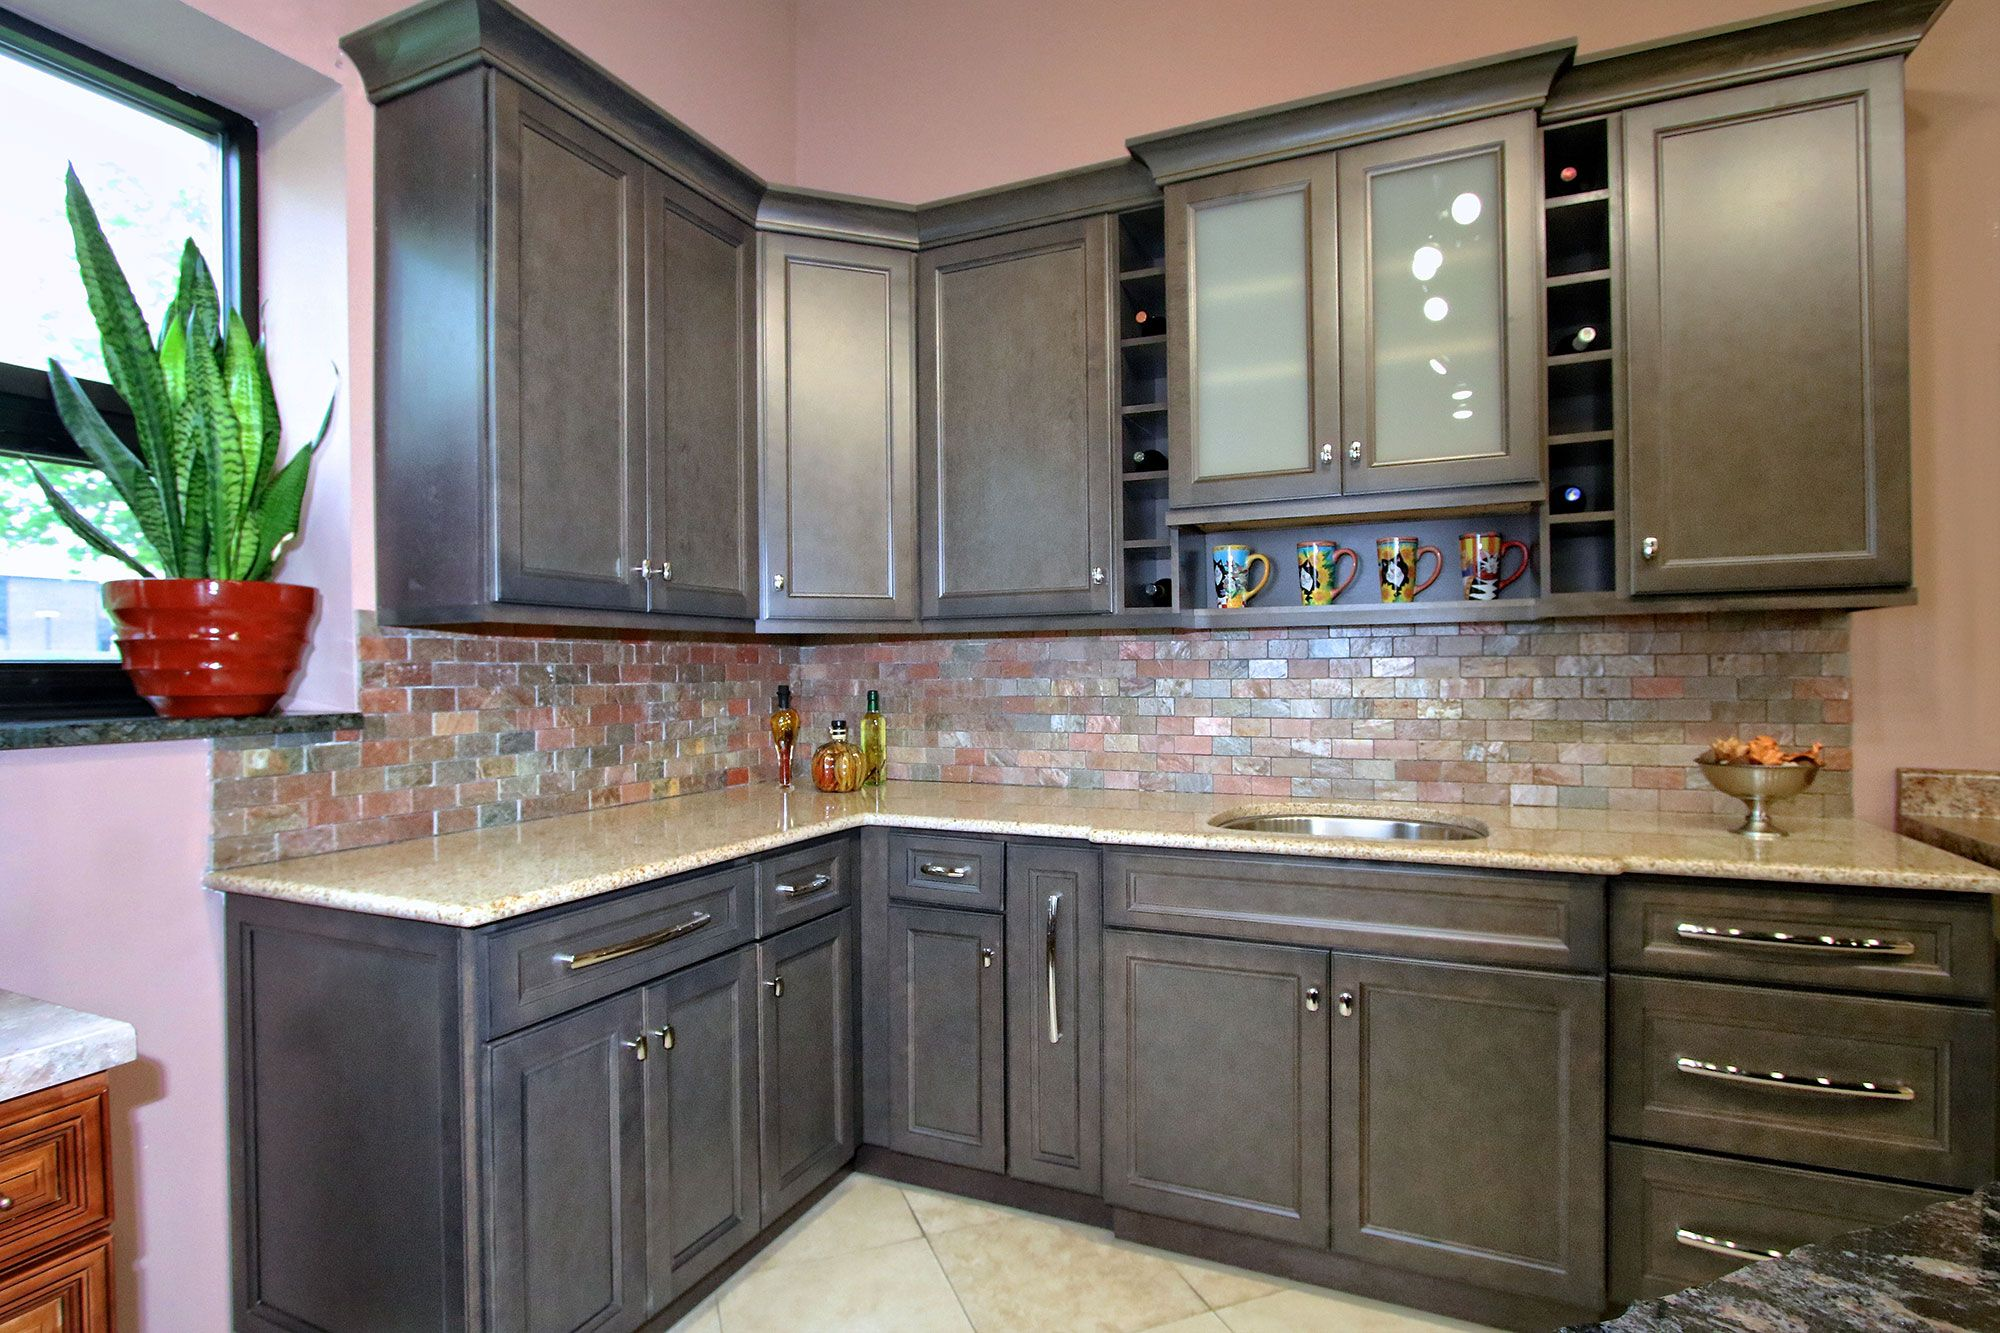 Aspen Kitchen Cabinets Wood Cabinets InStiock InStock - Bathroom vanities san jose for bathroom decor ideas